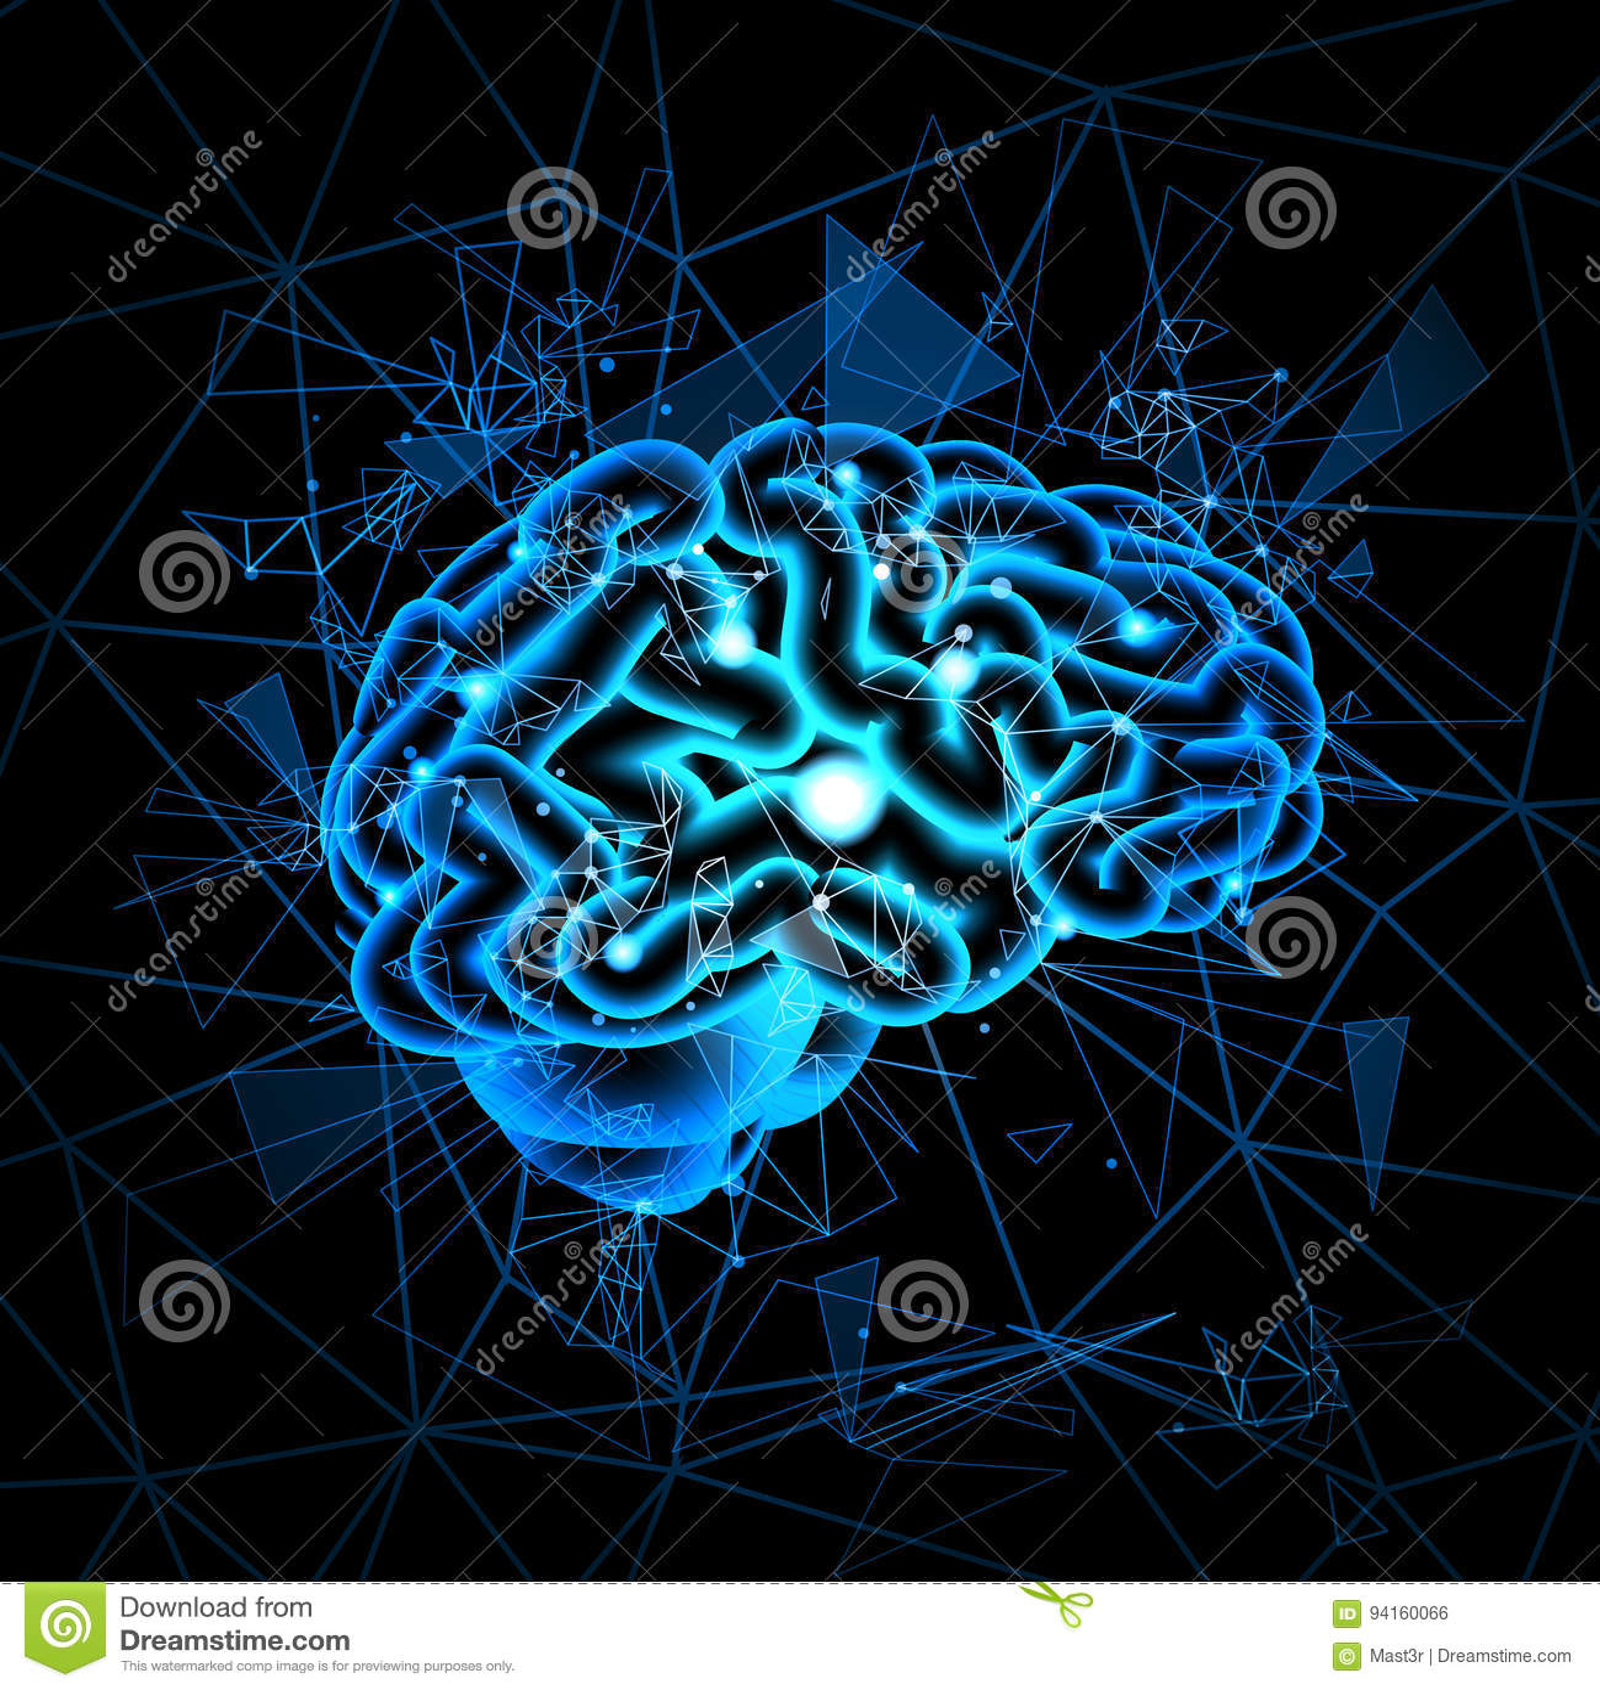 Ways to increase brain activity photo 4